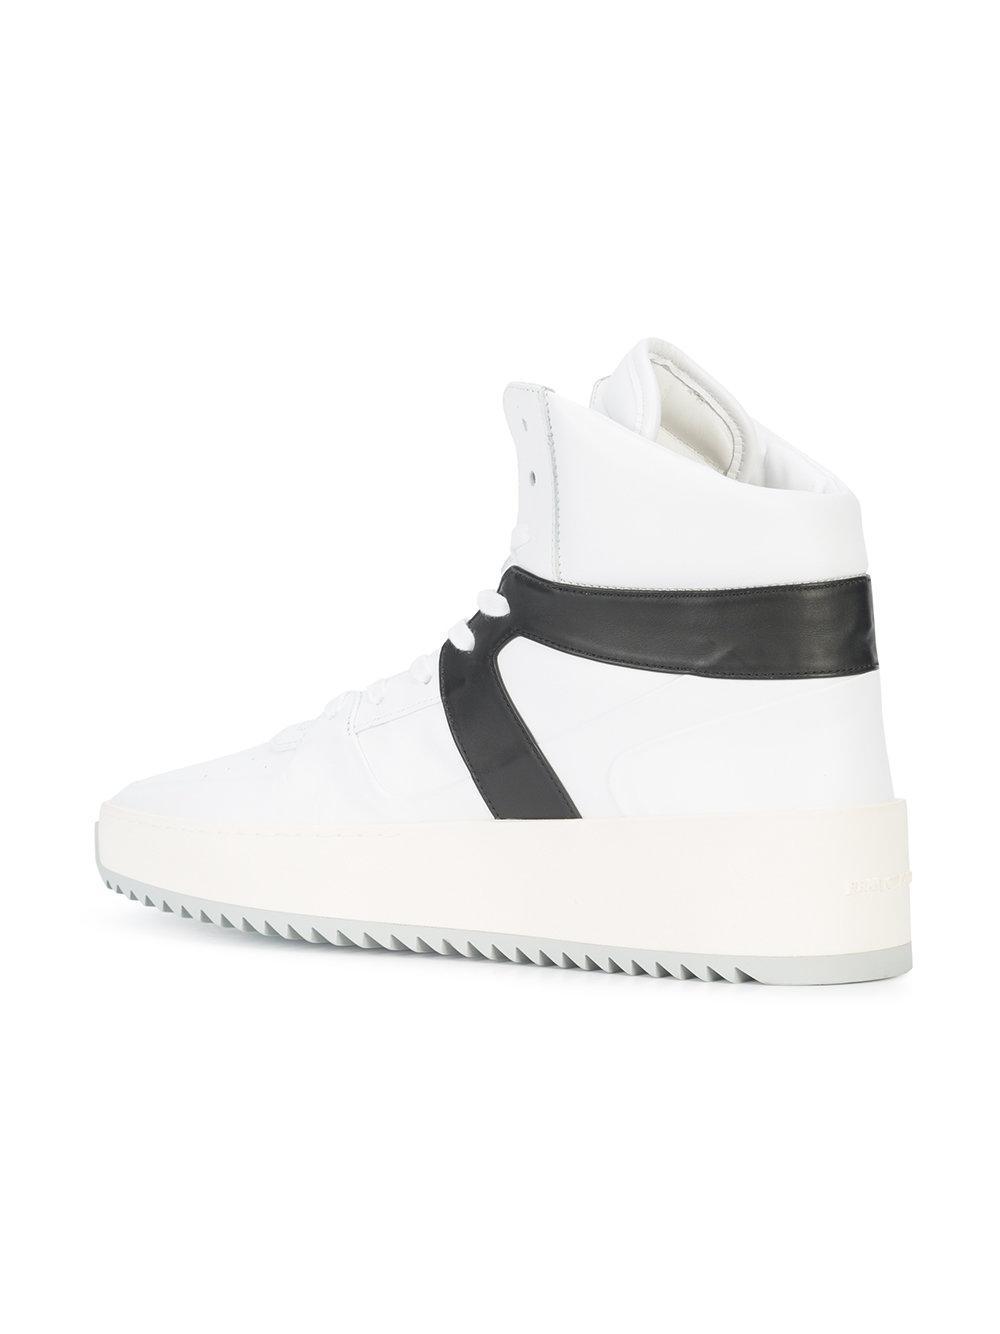 contrast stripe hi-top sneakers - White Fear of God 5yFzIyW